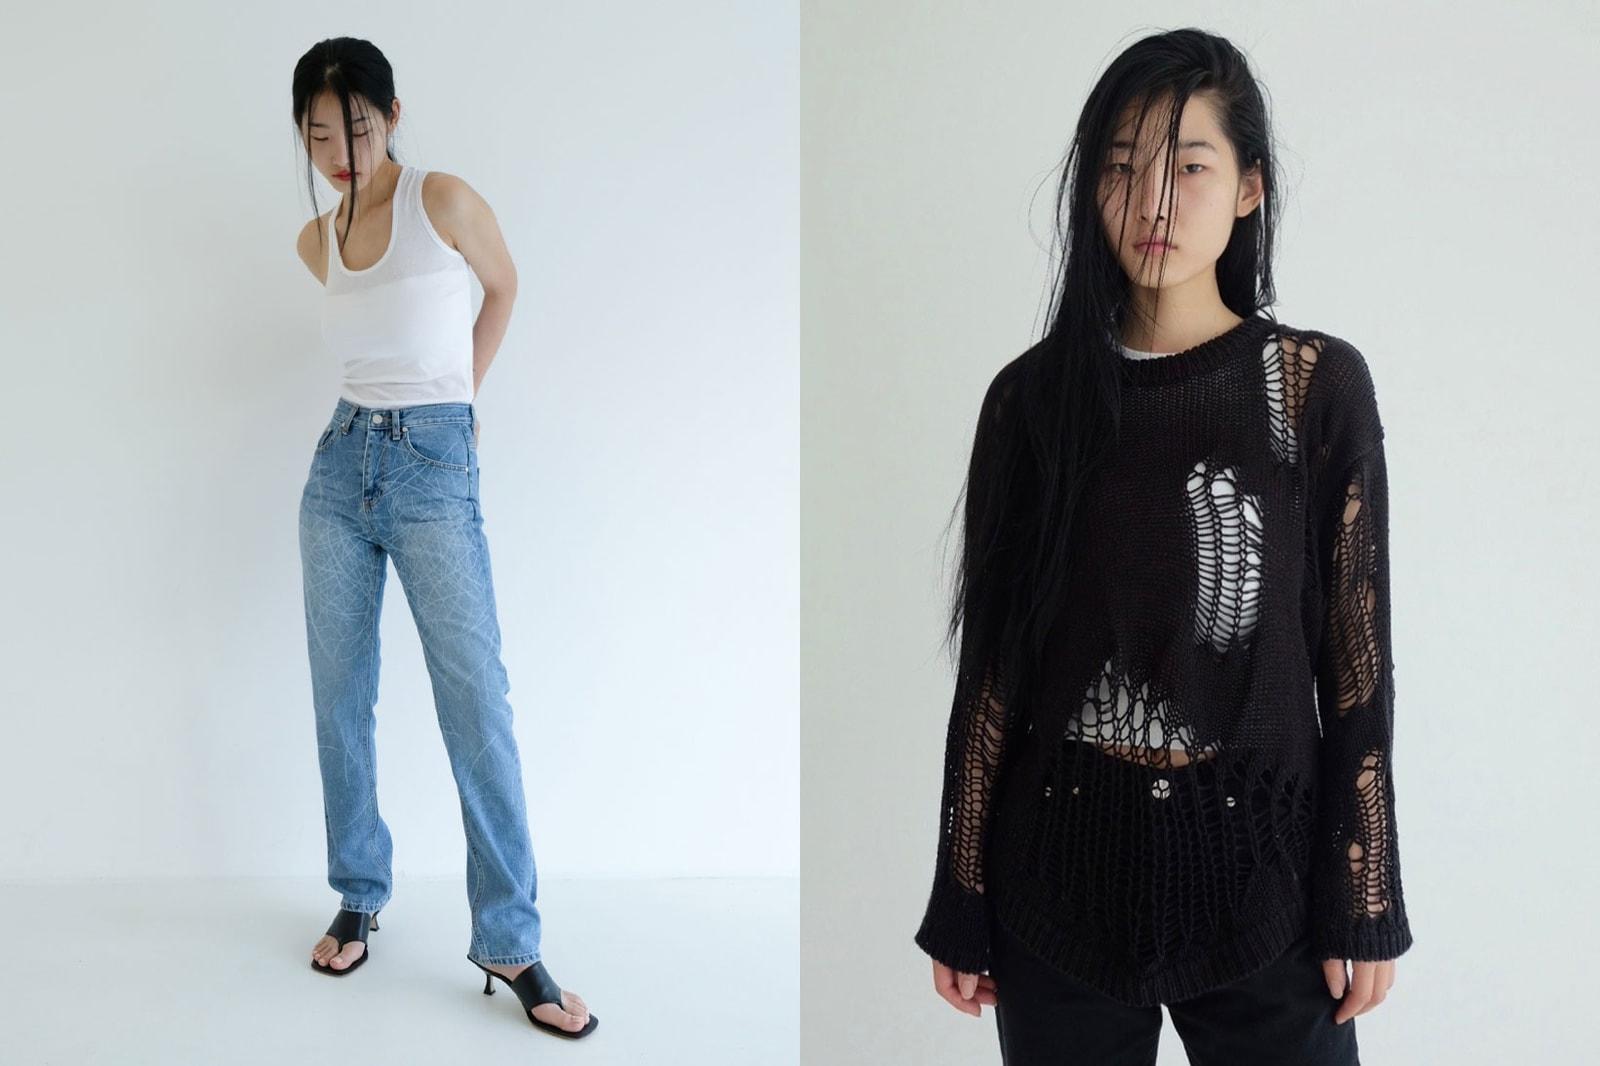 korean fashion emerging female fashion designers brands tuming white tee jeans knit sweater